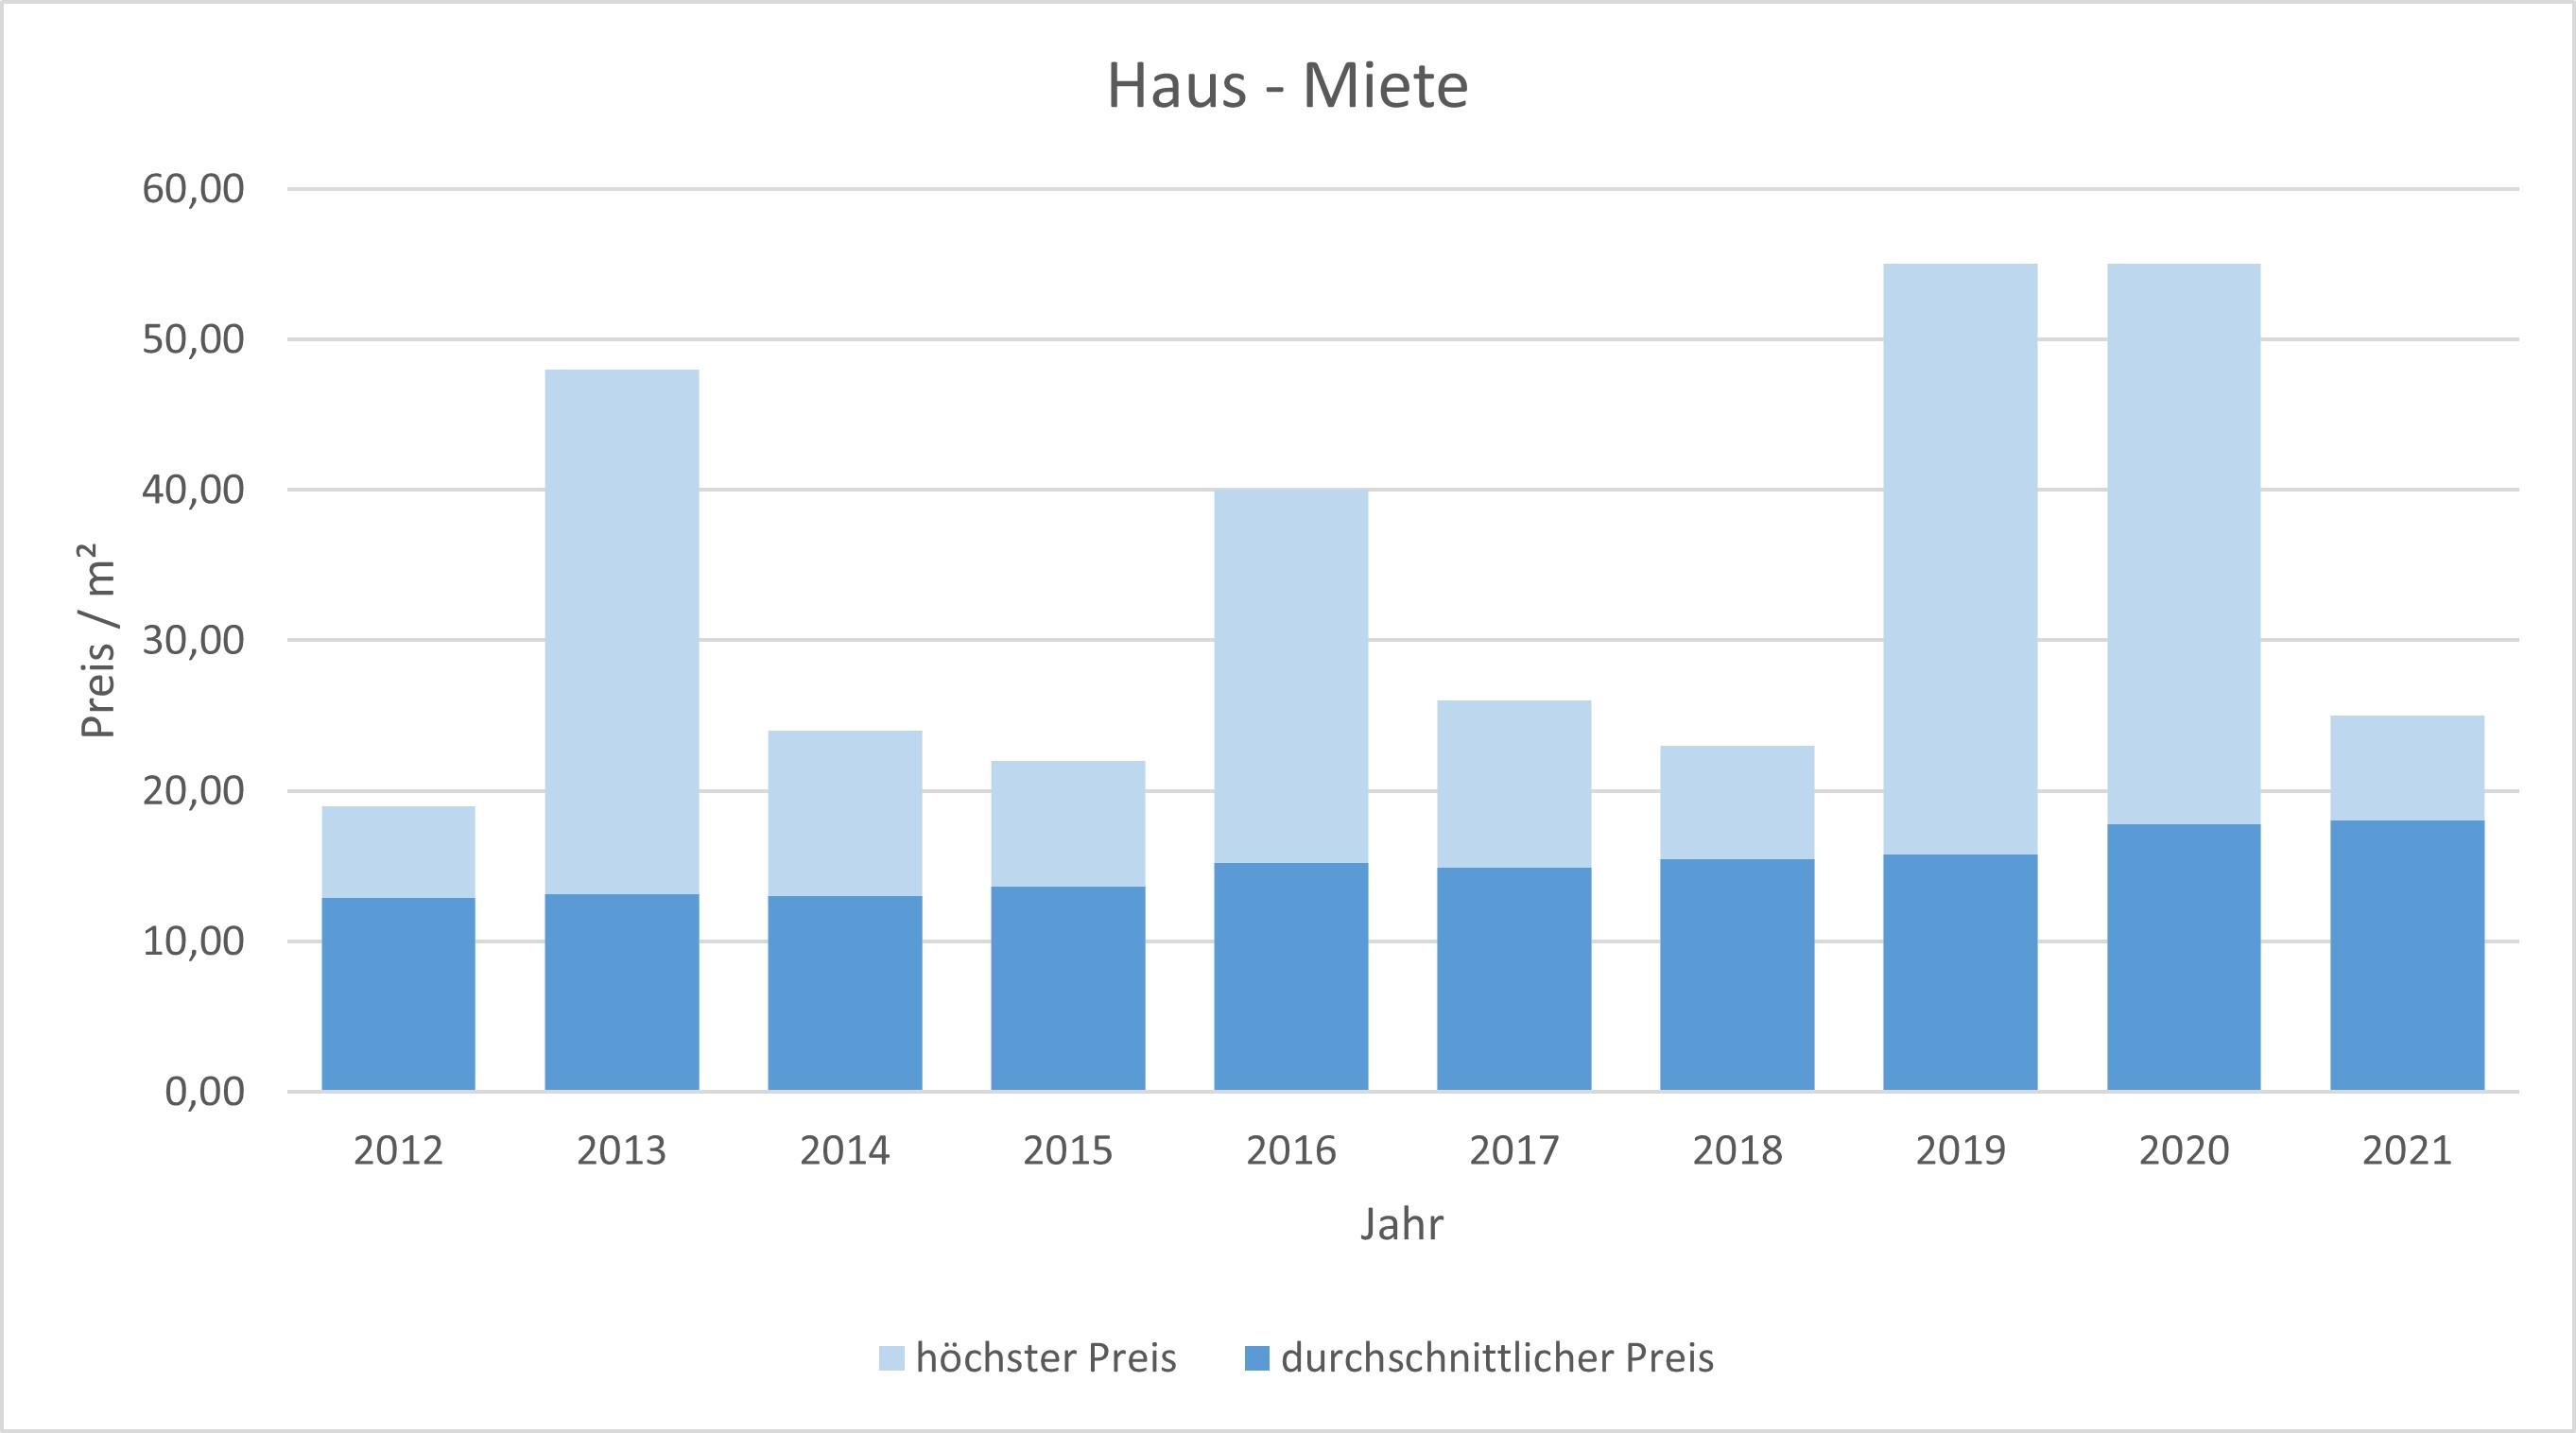 München - Trudering Haus mieten vermieten Preis Bewertung Makler 2019 2020 2021 www.happy-immo.de